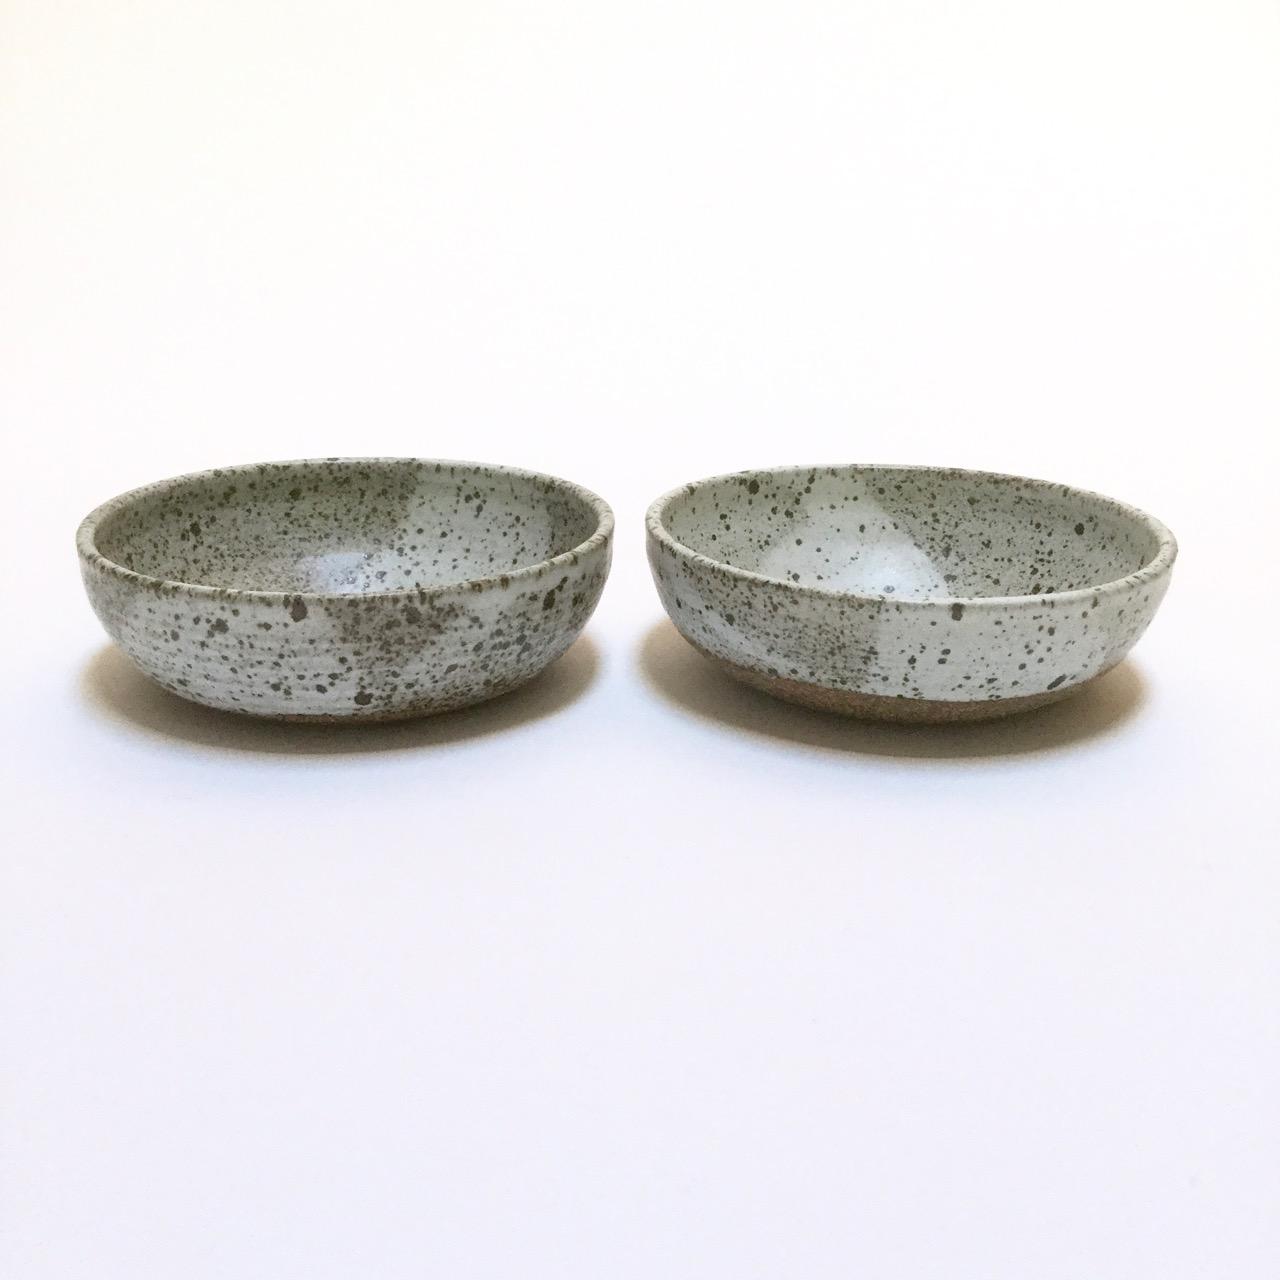 1146 Pair speckled bowls side.jpg